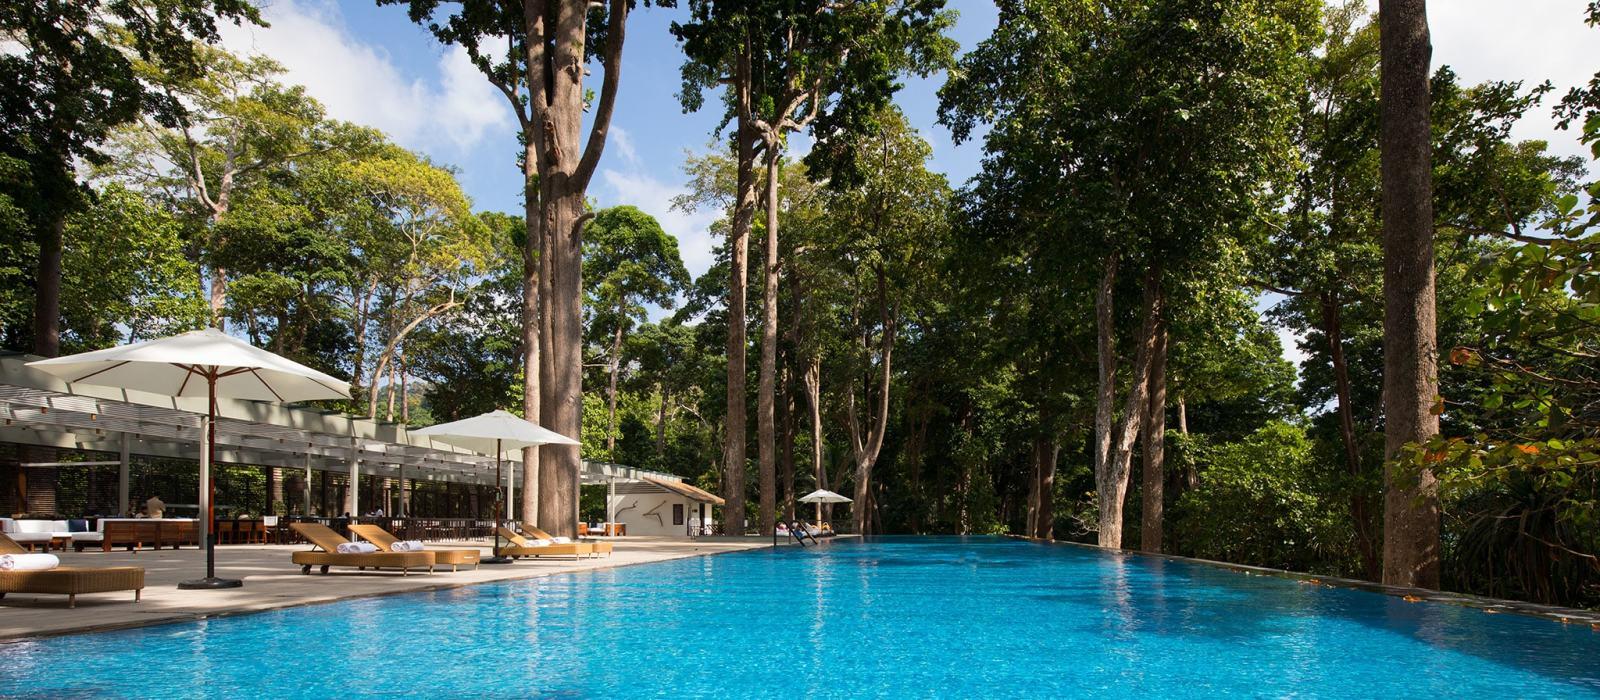 Hotel Taj Exotica Resort & Spa, Andamans Islands & Beaches